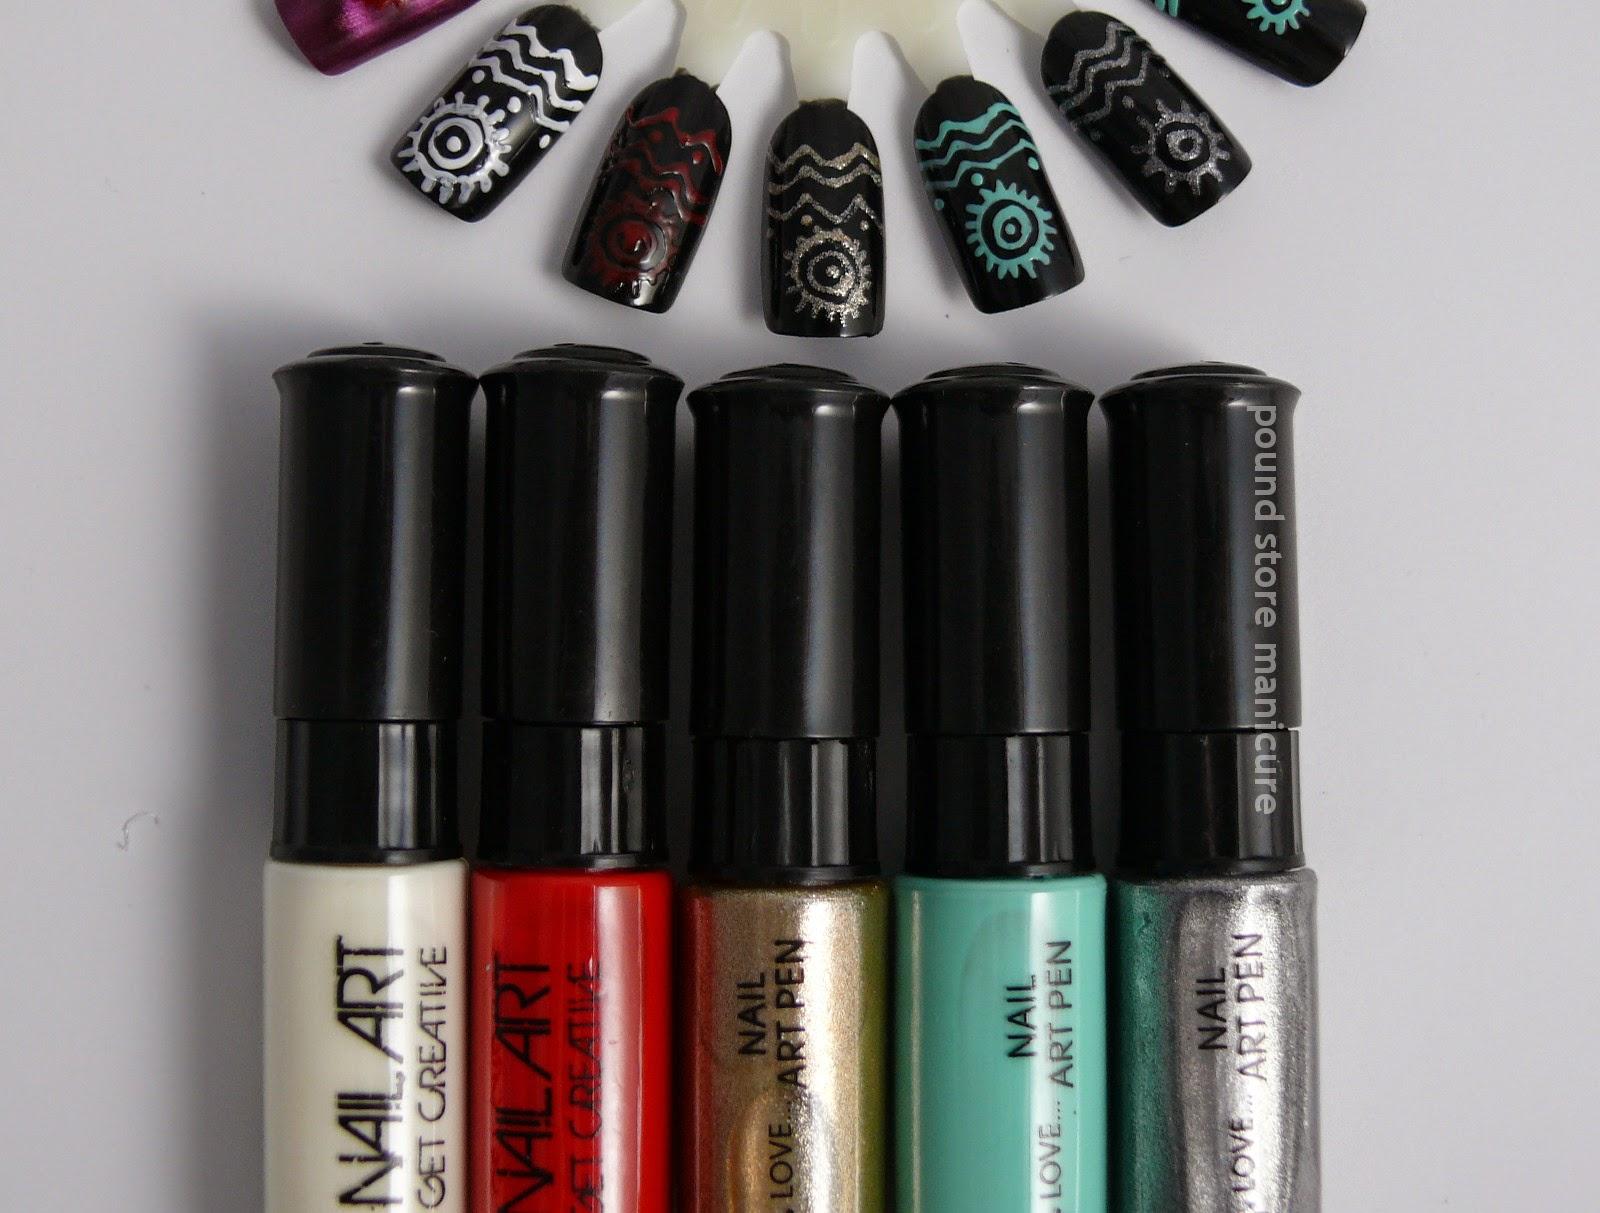 Pound Store Manicure Primark Nail Art Pens